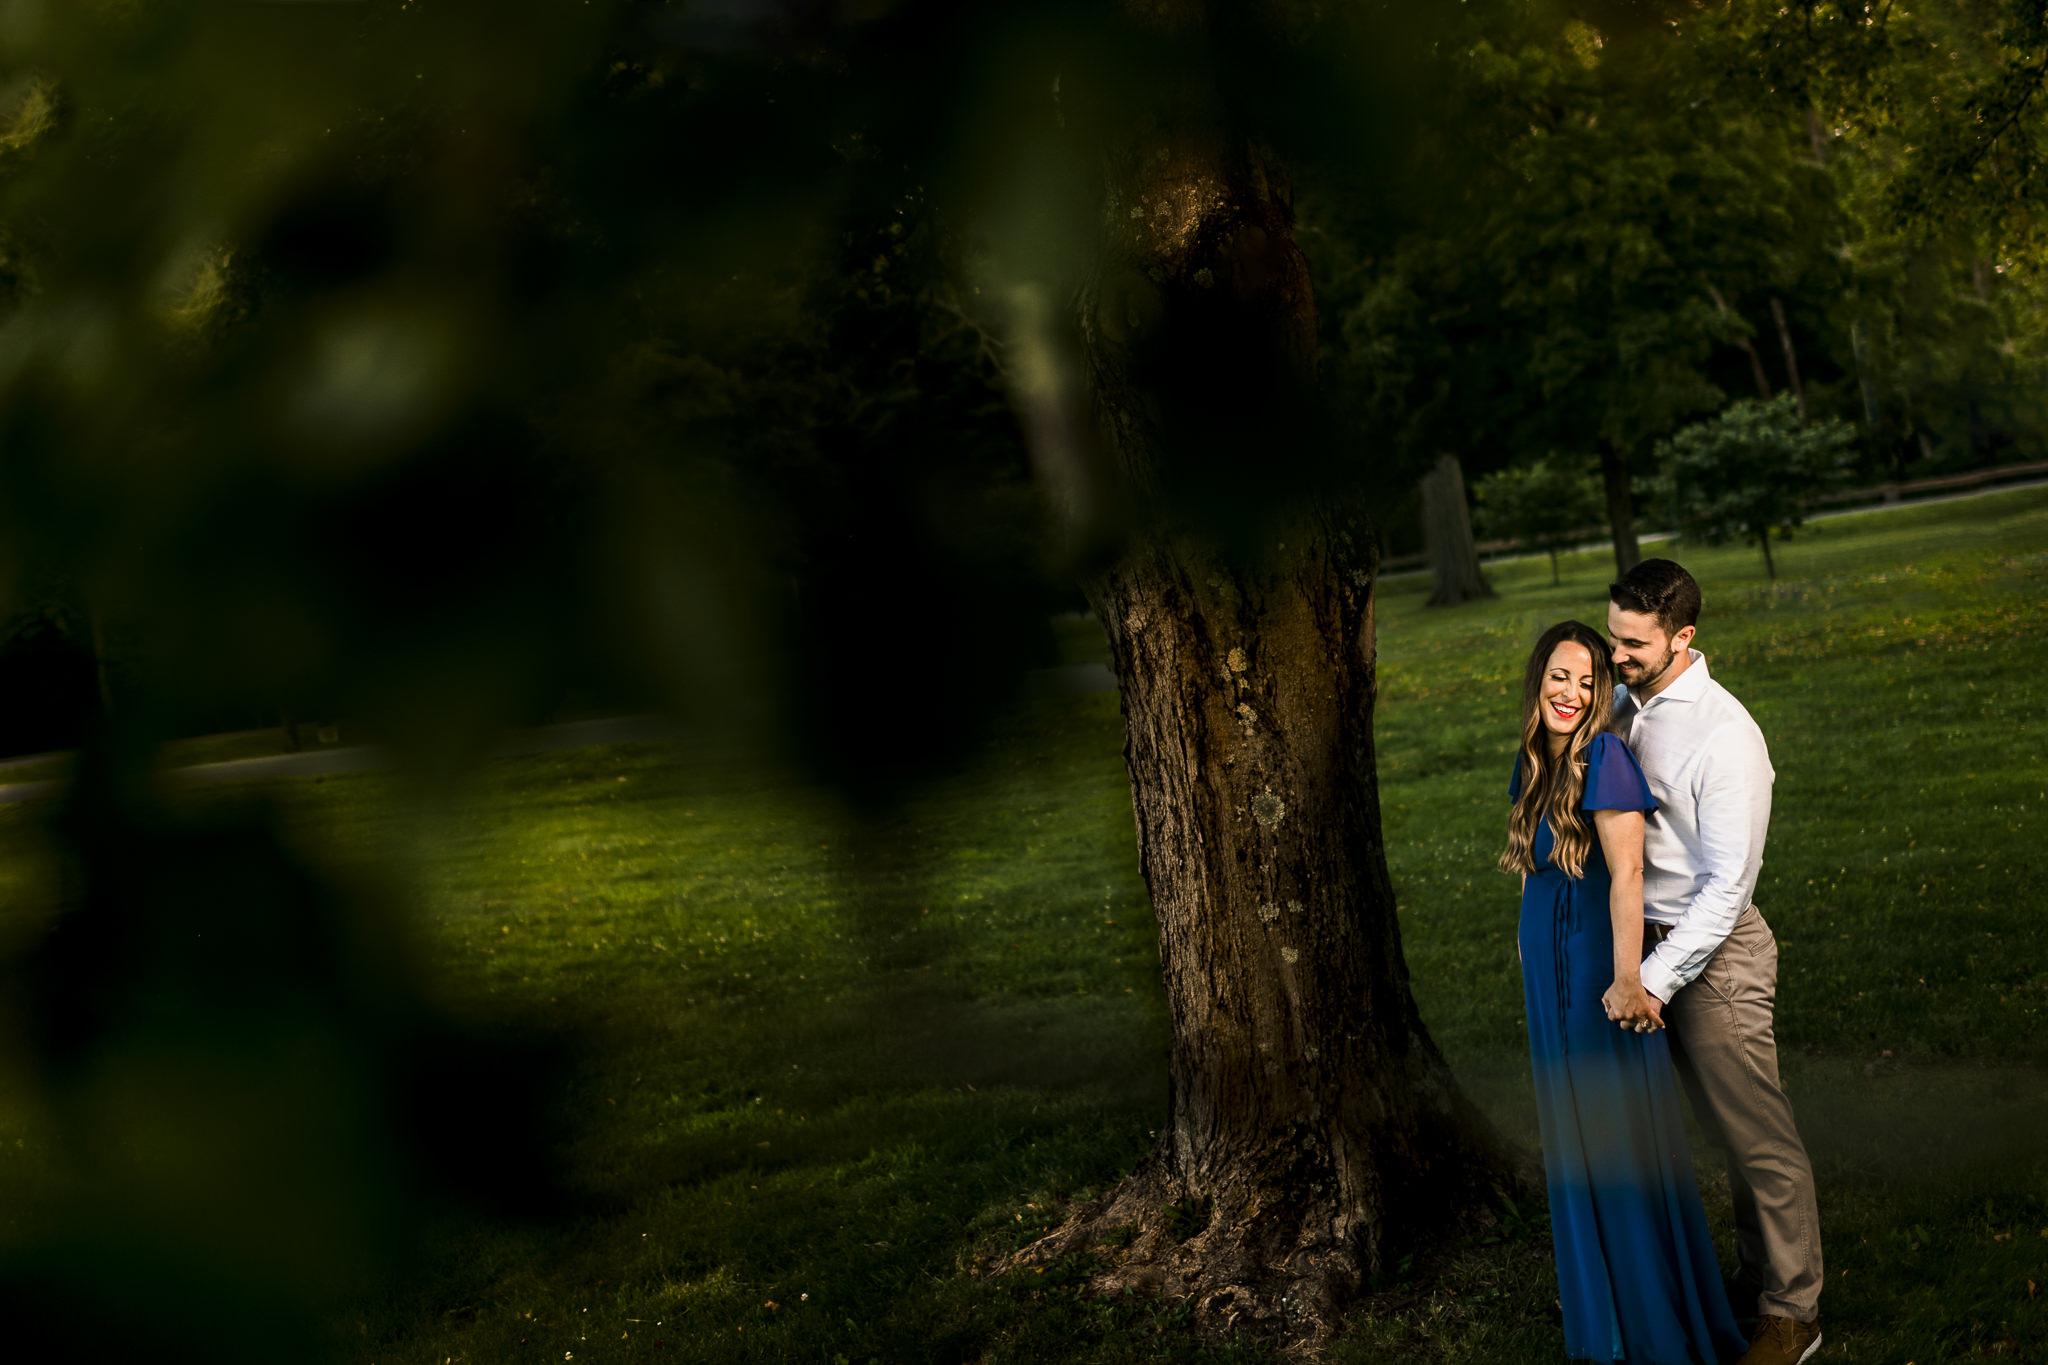 McKowen-Natirar-Park-Engagement-Photos-16.JPG